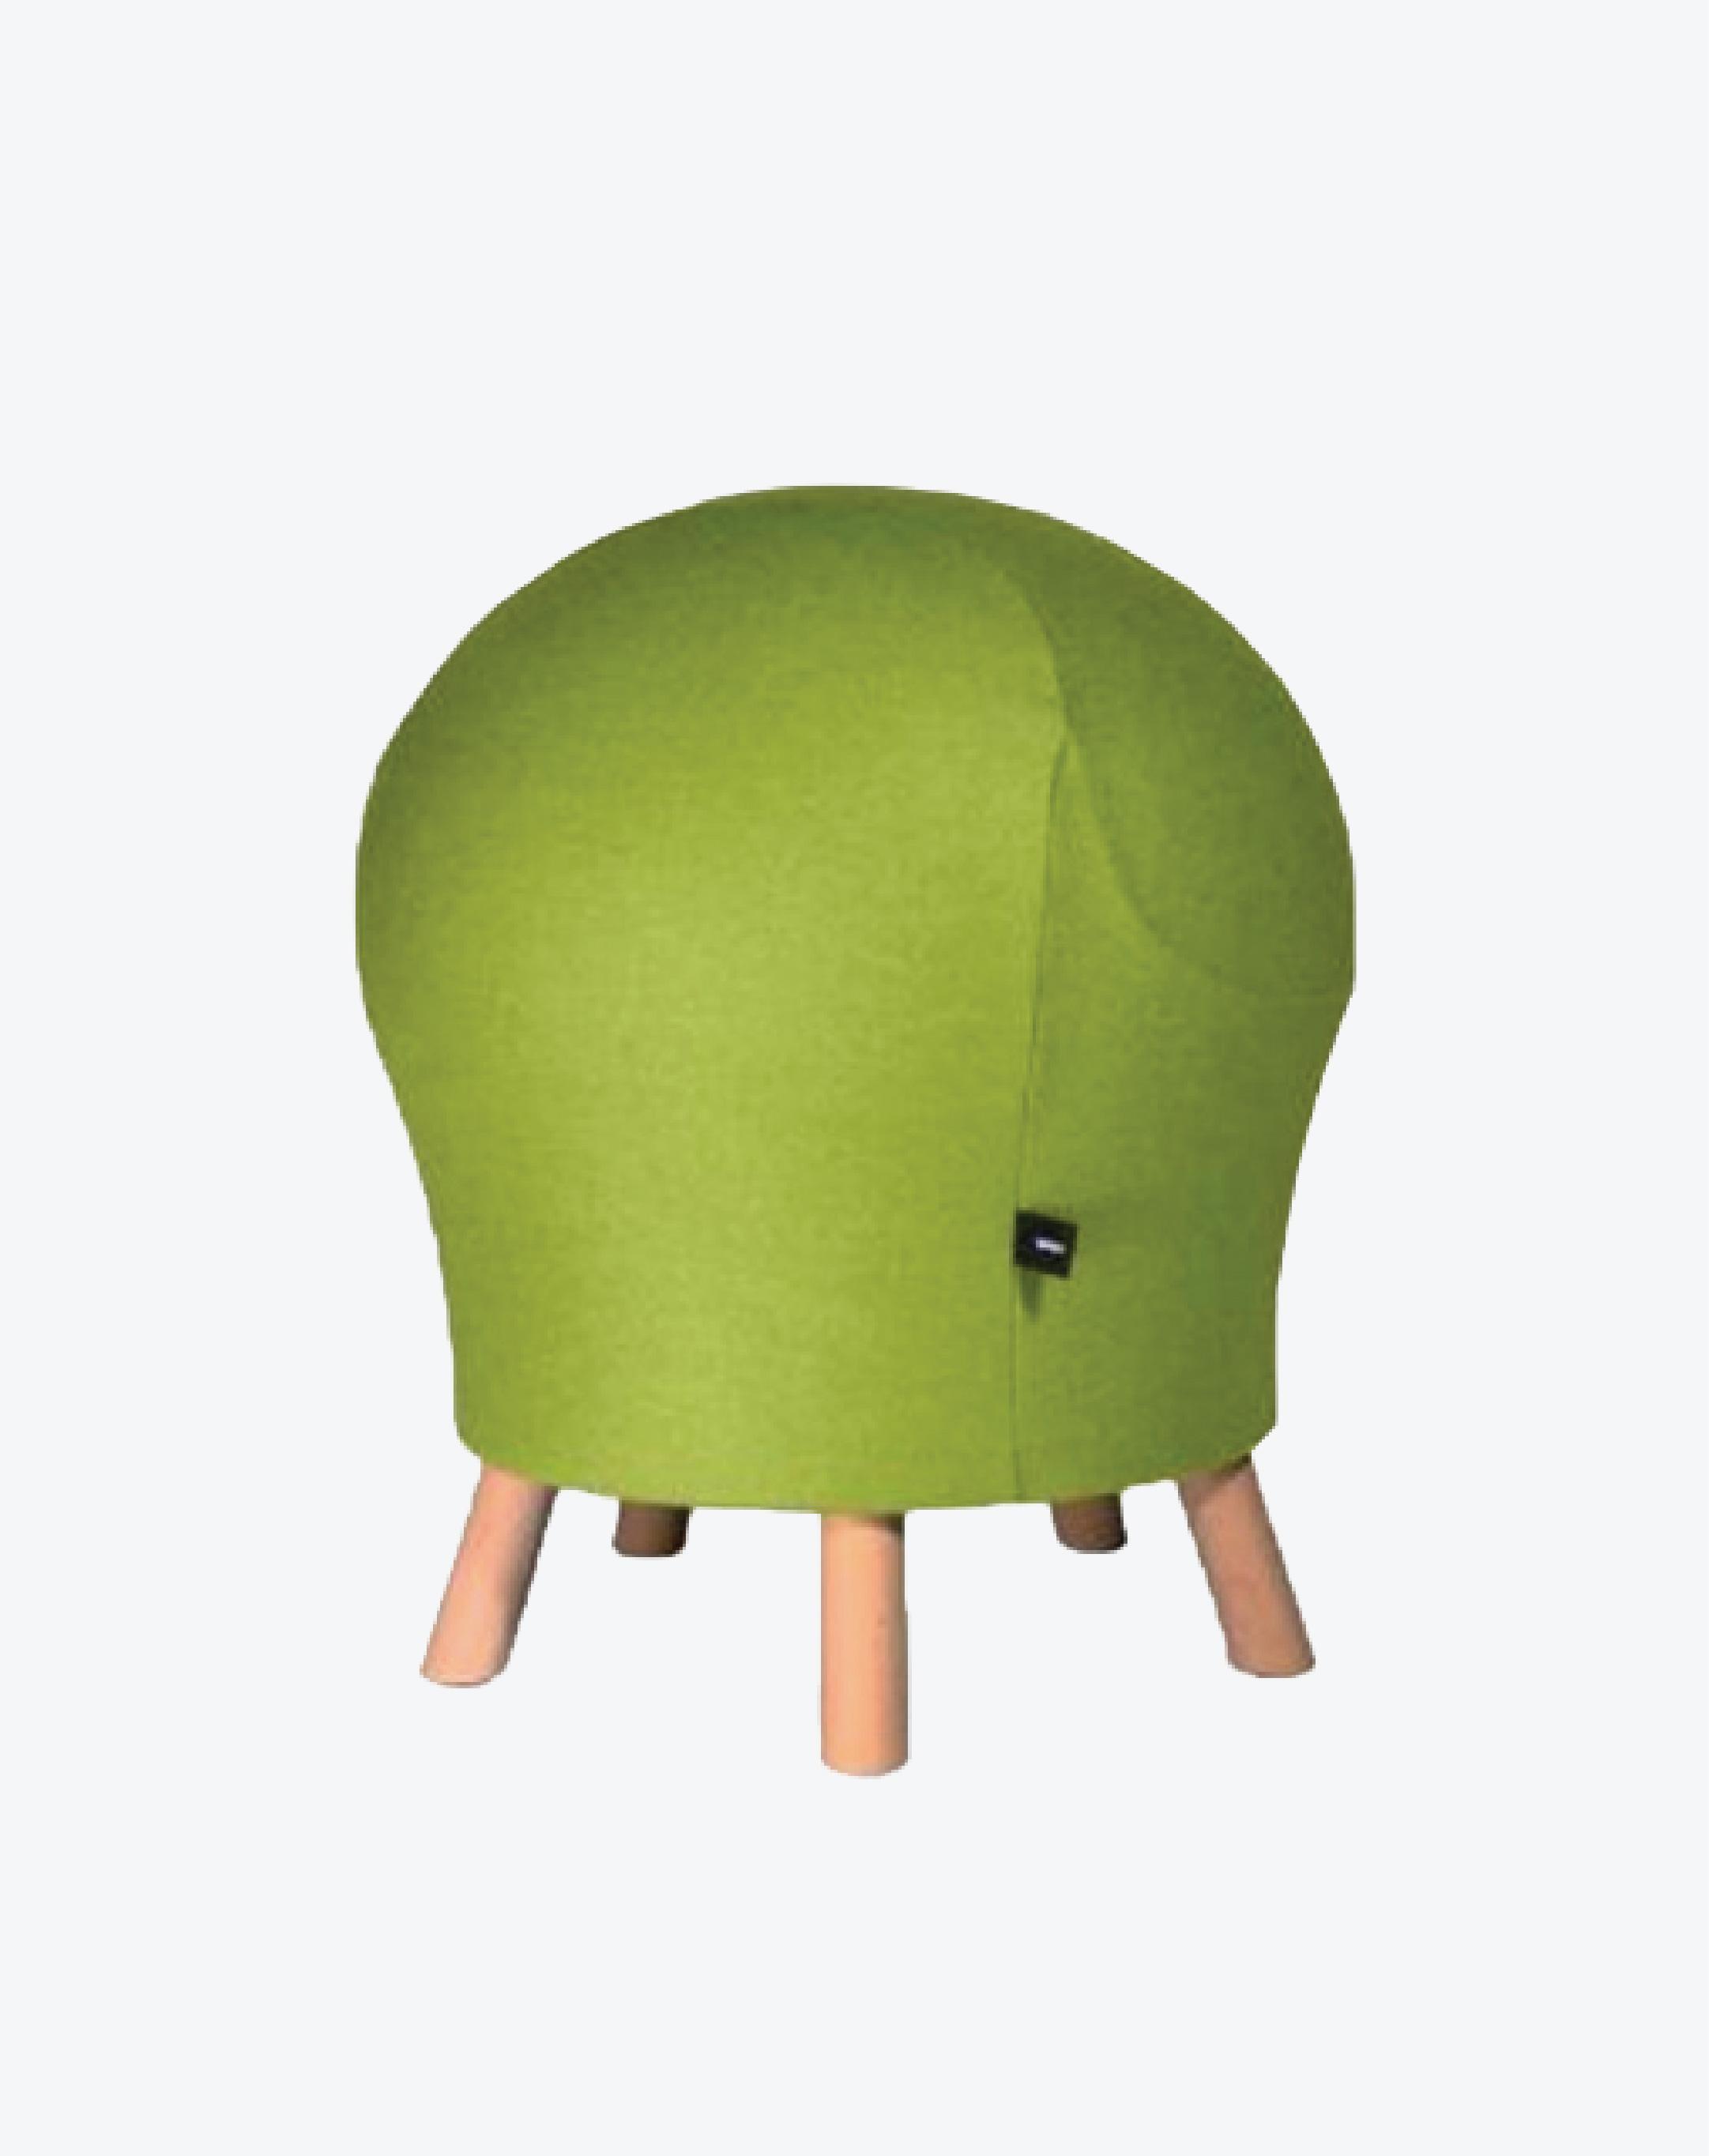 Topstar Ball Chair StayFitHK